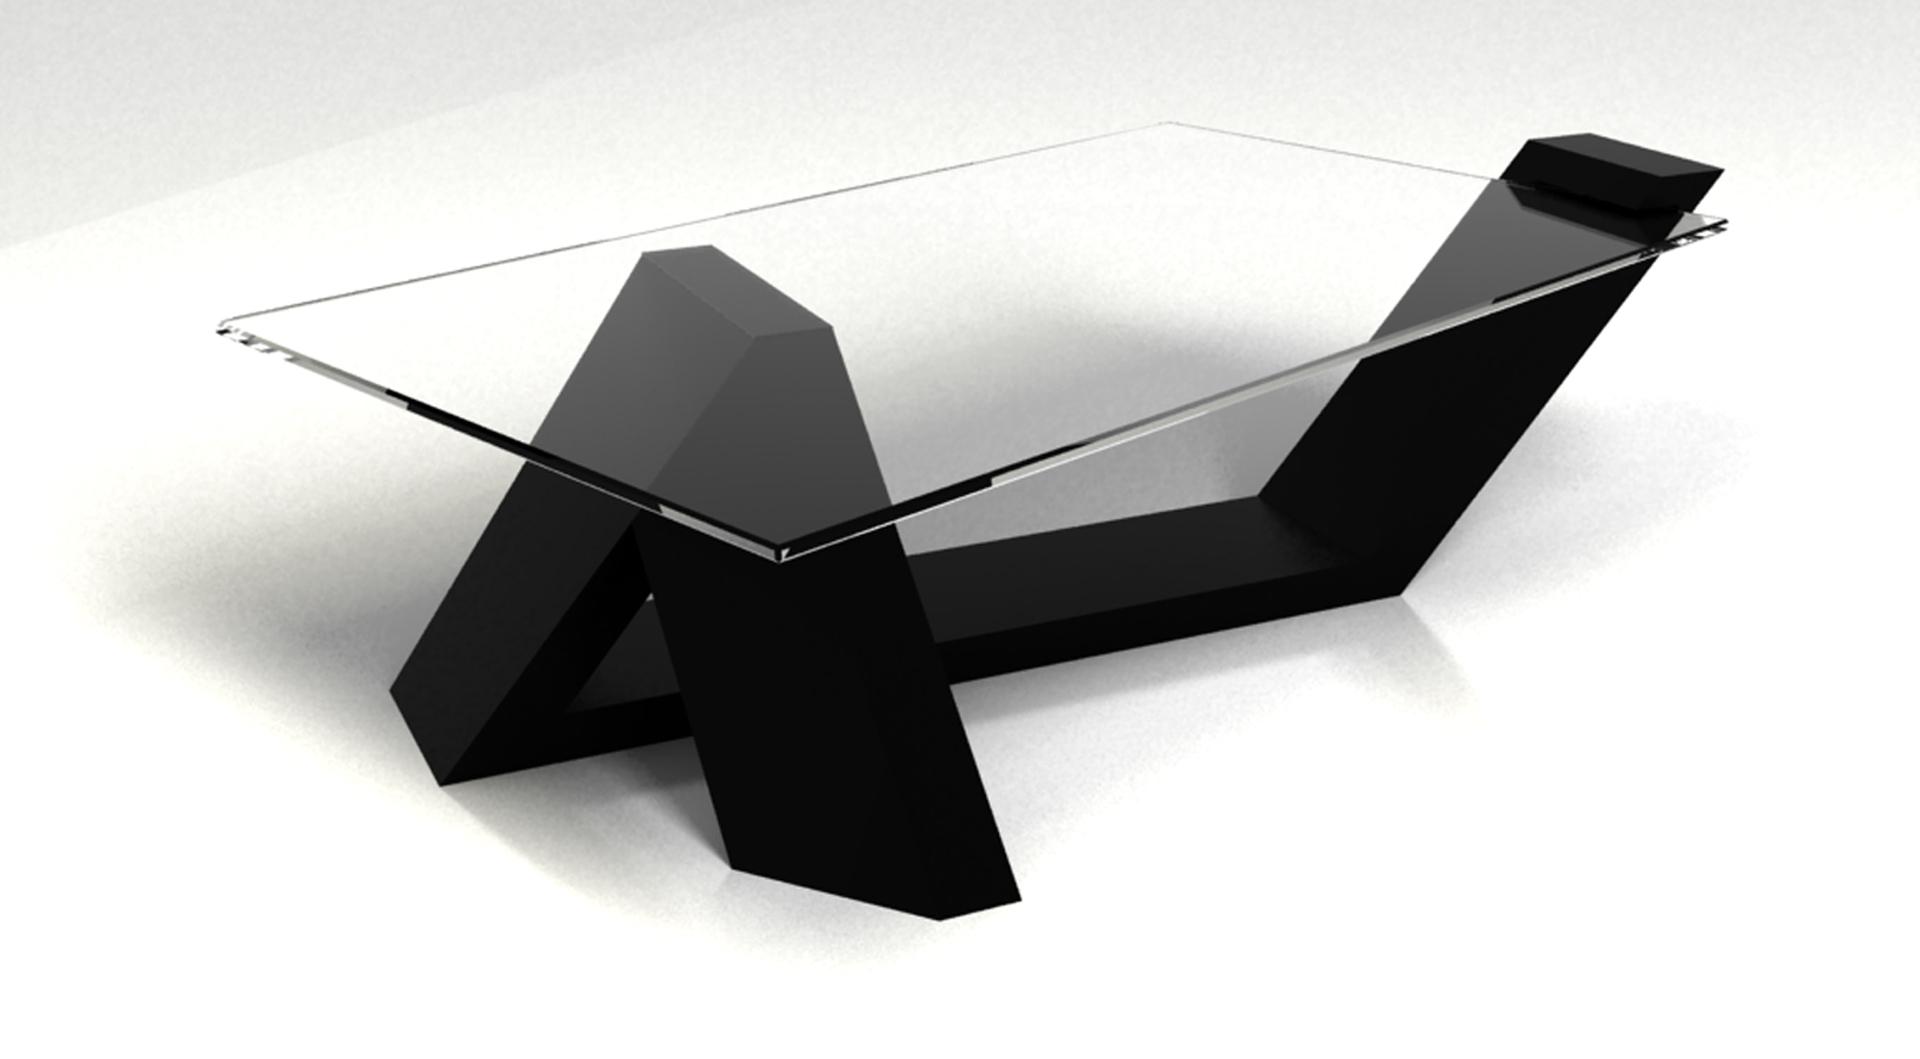 NOG Coffee Table by Cla Tschenett